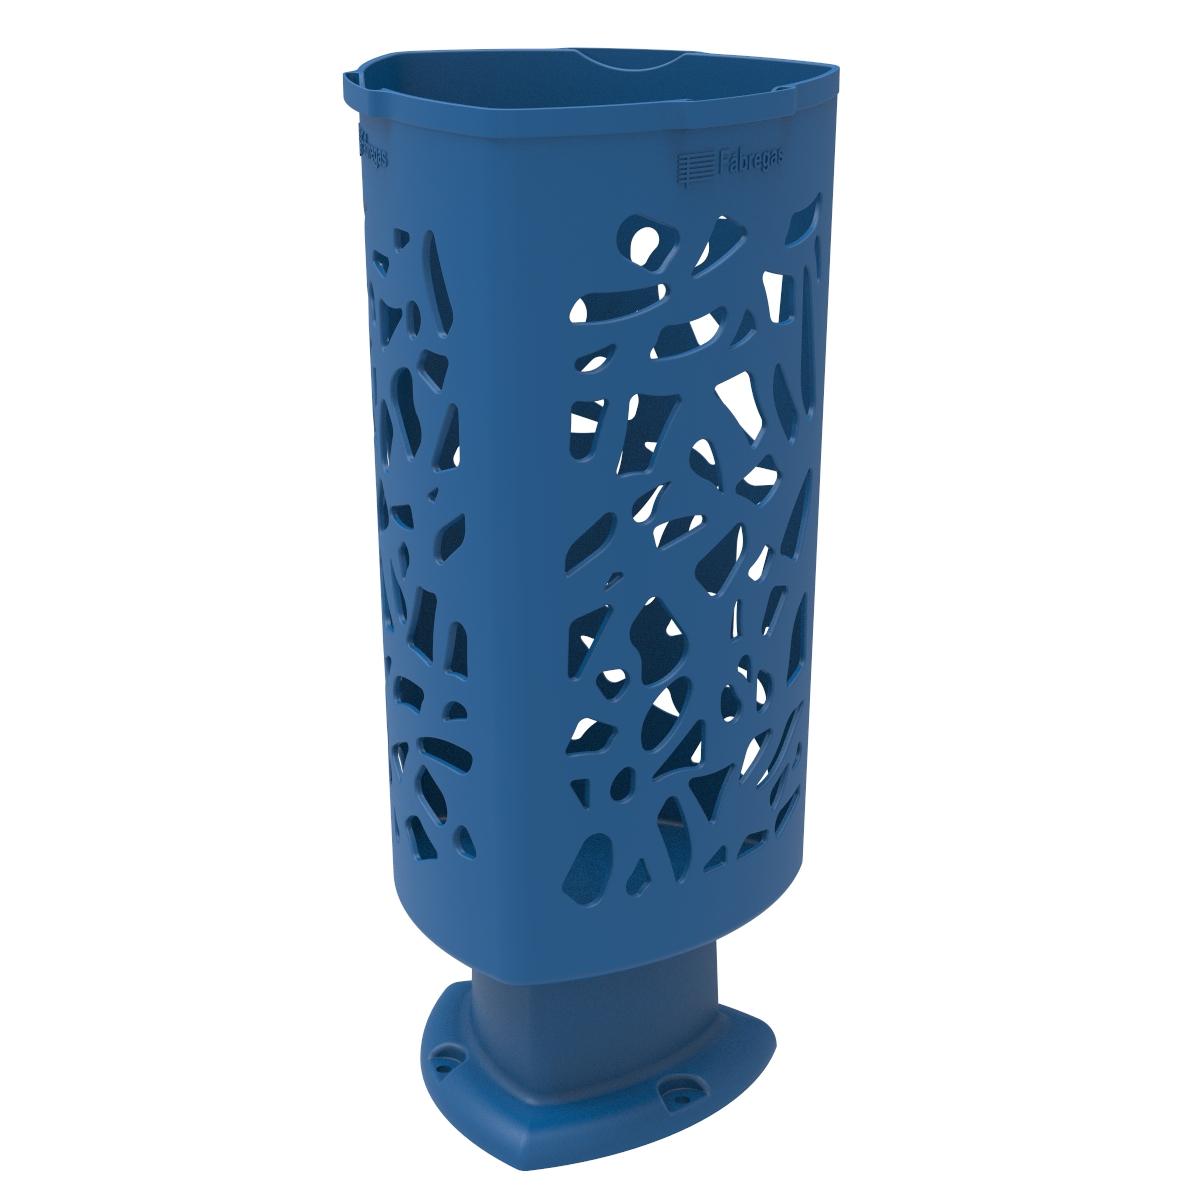 Paperera Scuderia de Polietilè color Blau RAL 5005 per Carrer